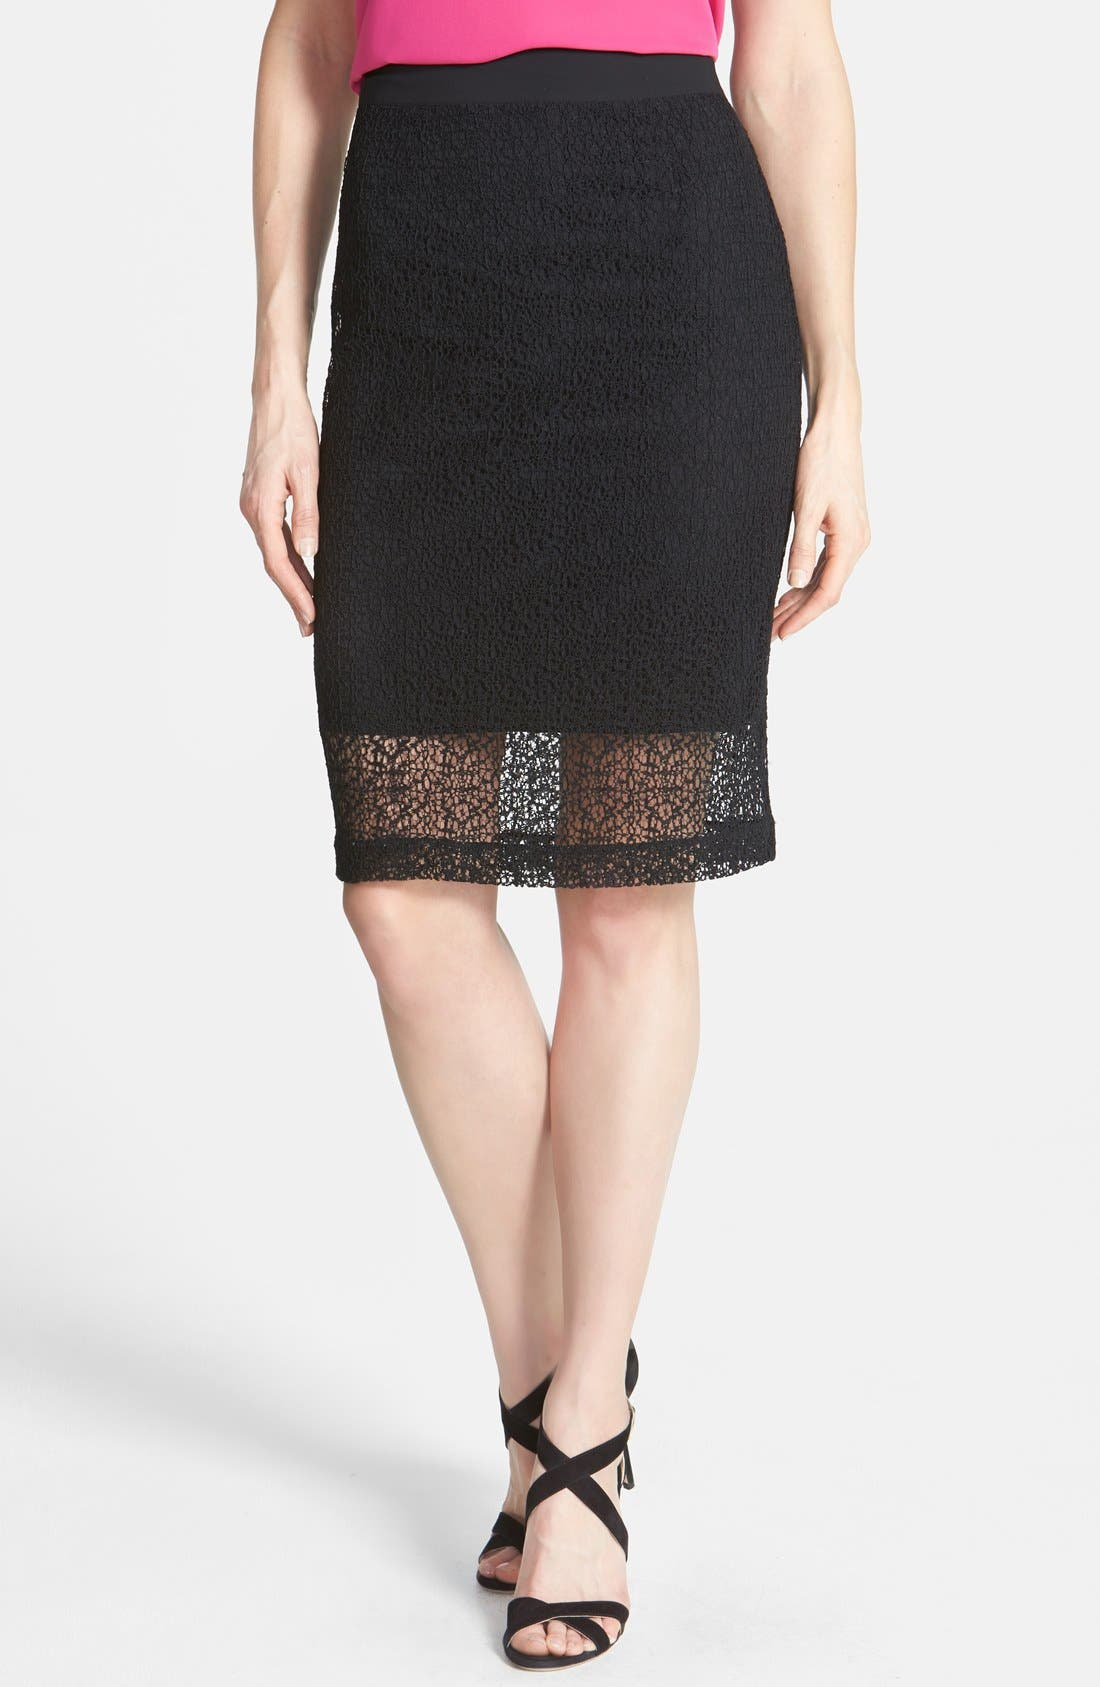 Alternate Image 1 Selected - Halogen® 'Avalon' Lace Pencil Skirt (Petite)